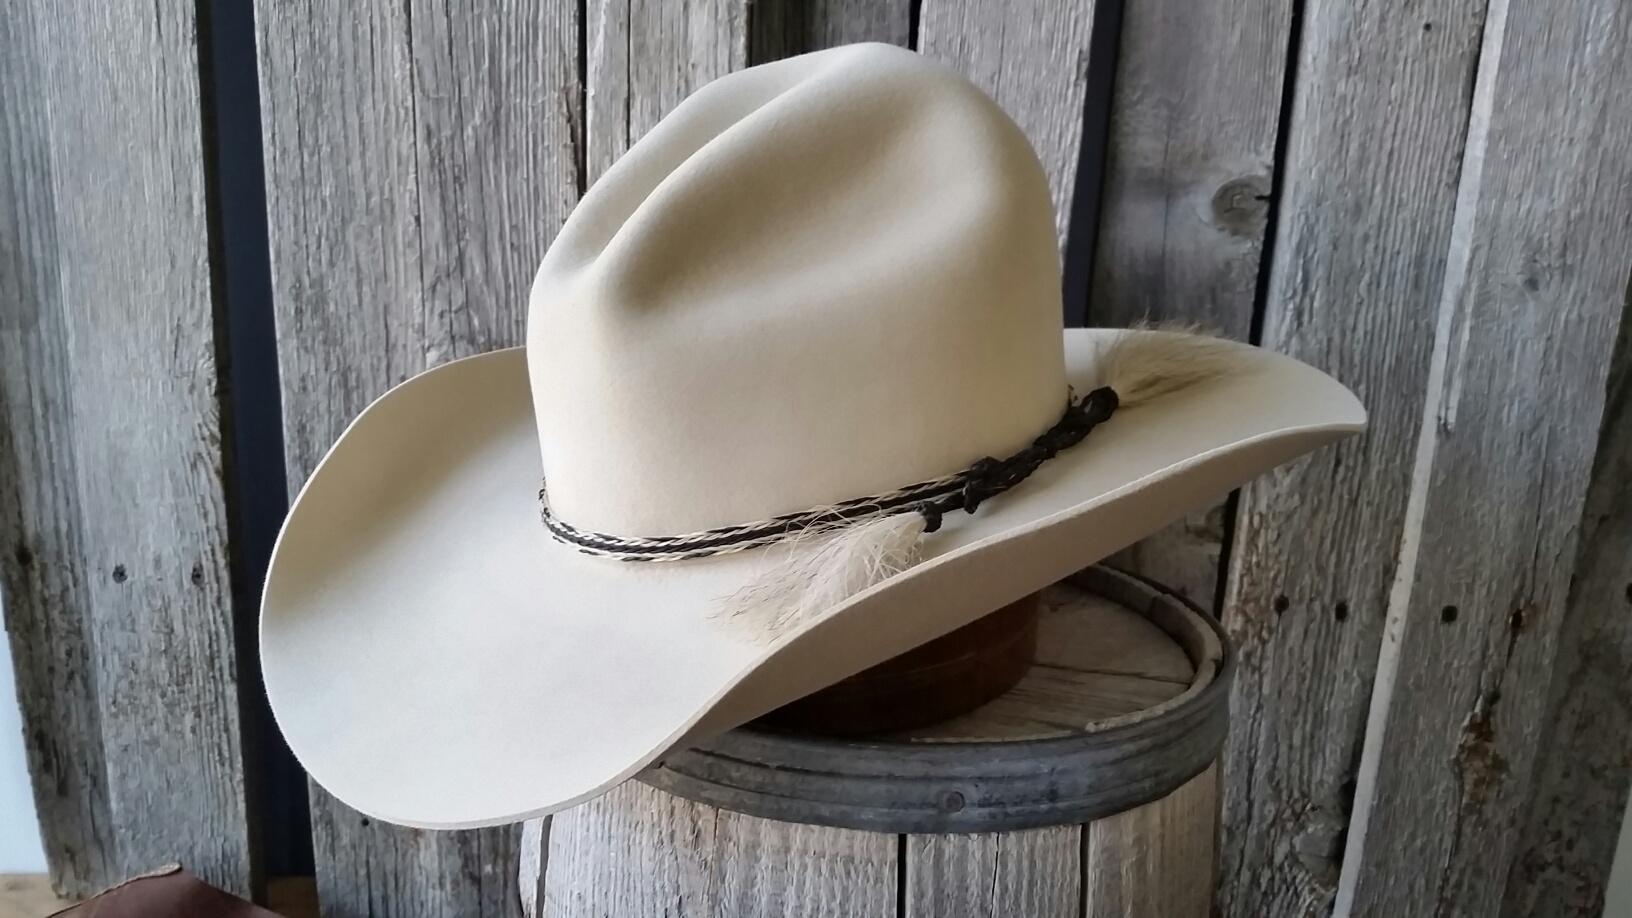 Hand Made Cowboy Hats - Hat HD Image Ukjugs.Org 100f8a70ef5a